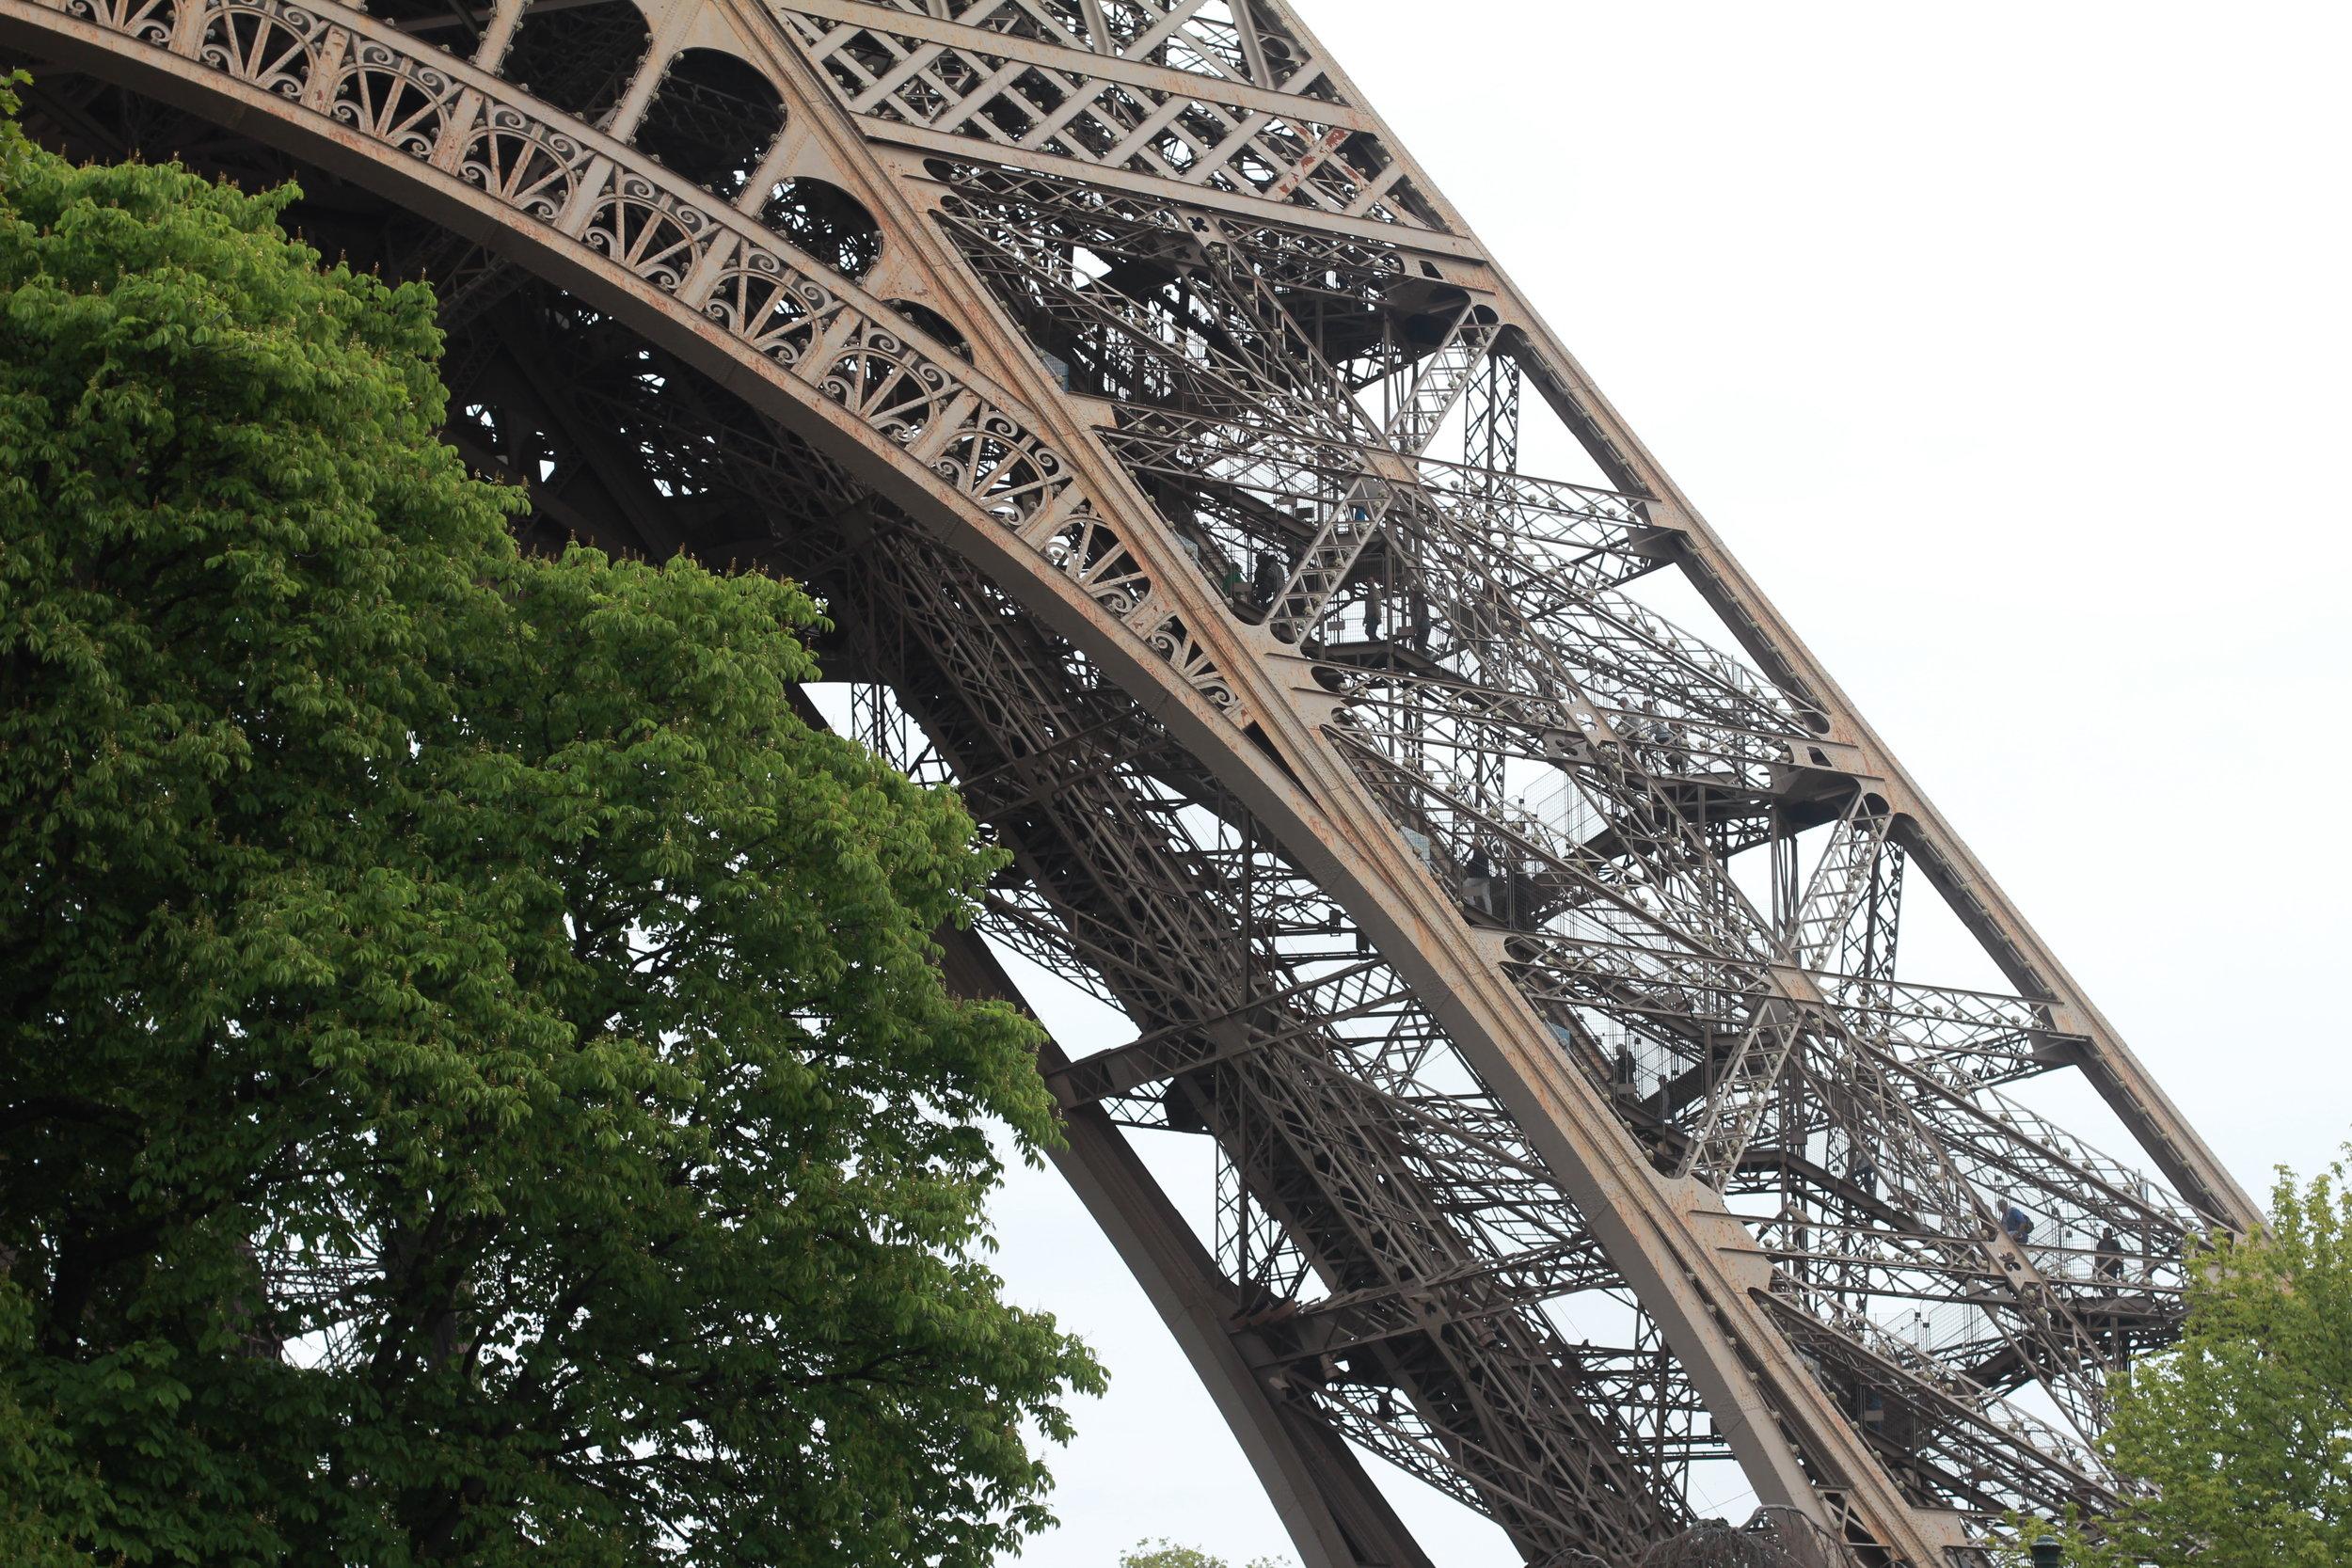 eiffel tower, paris   seekthewelfare